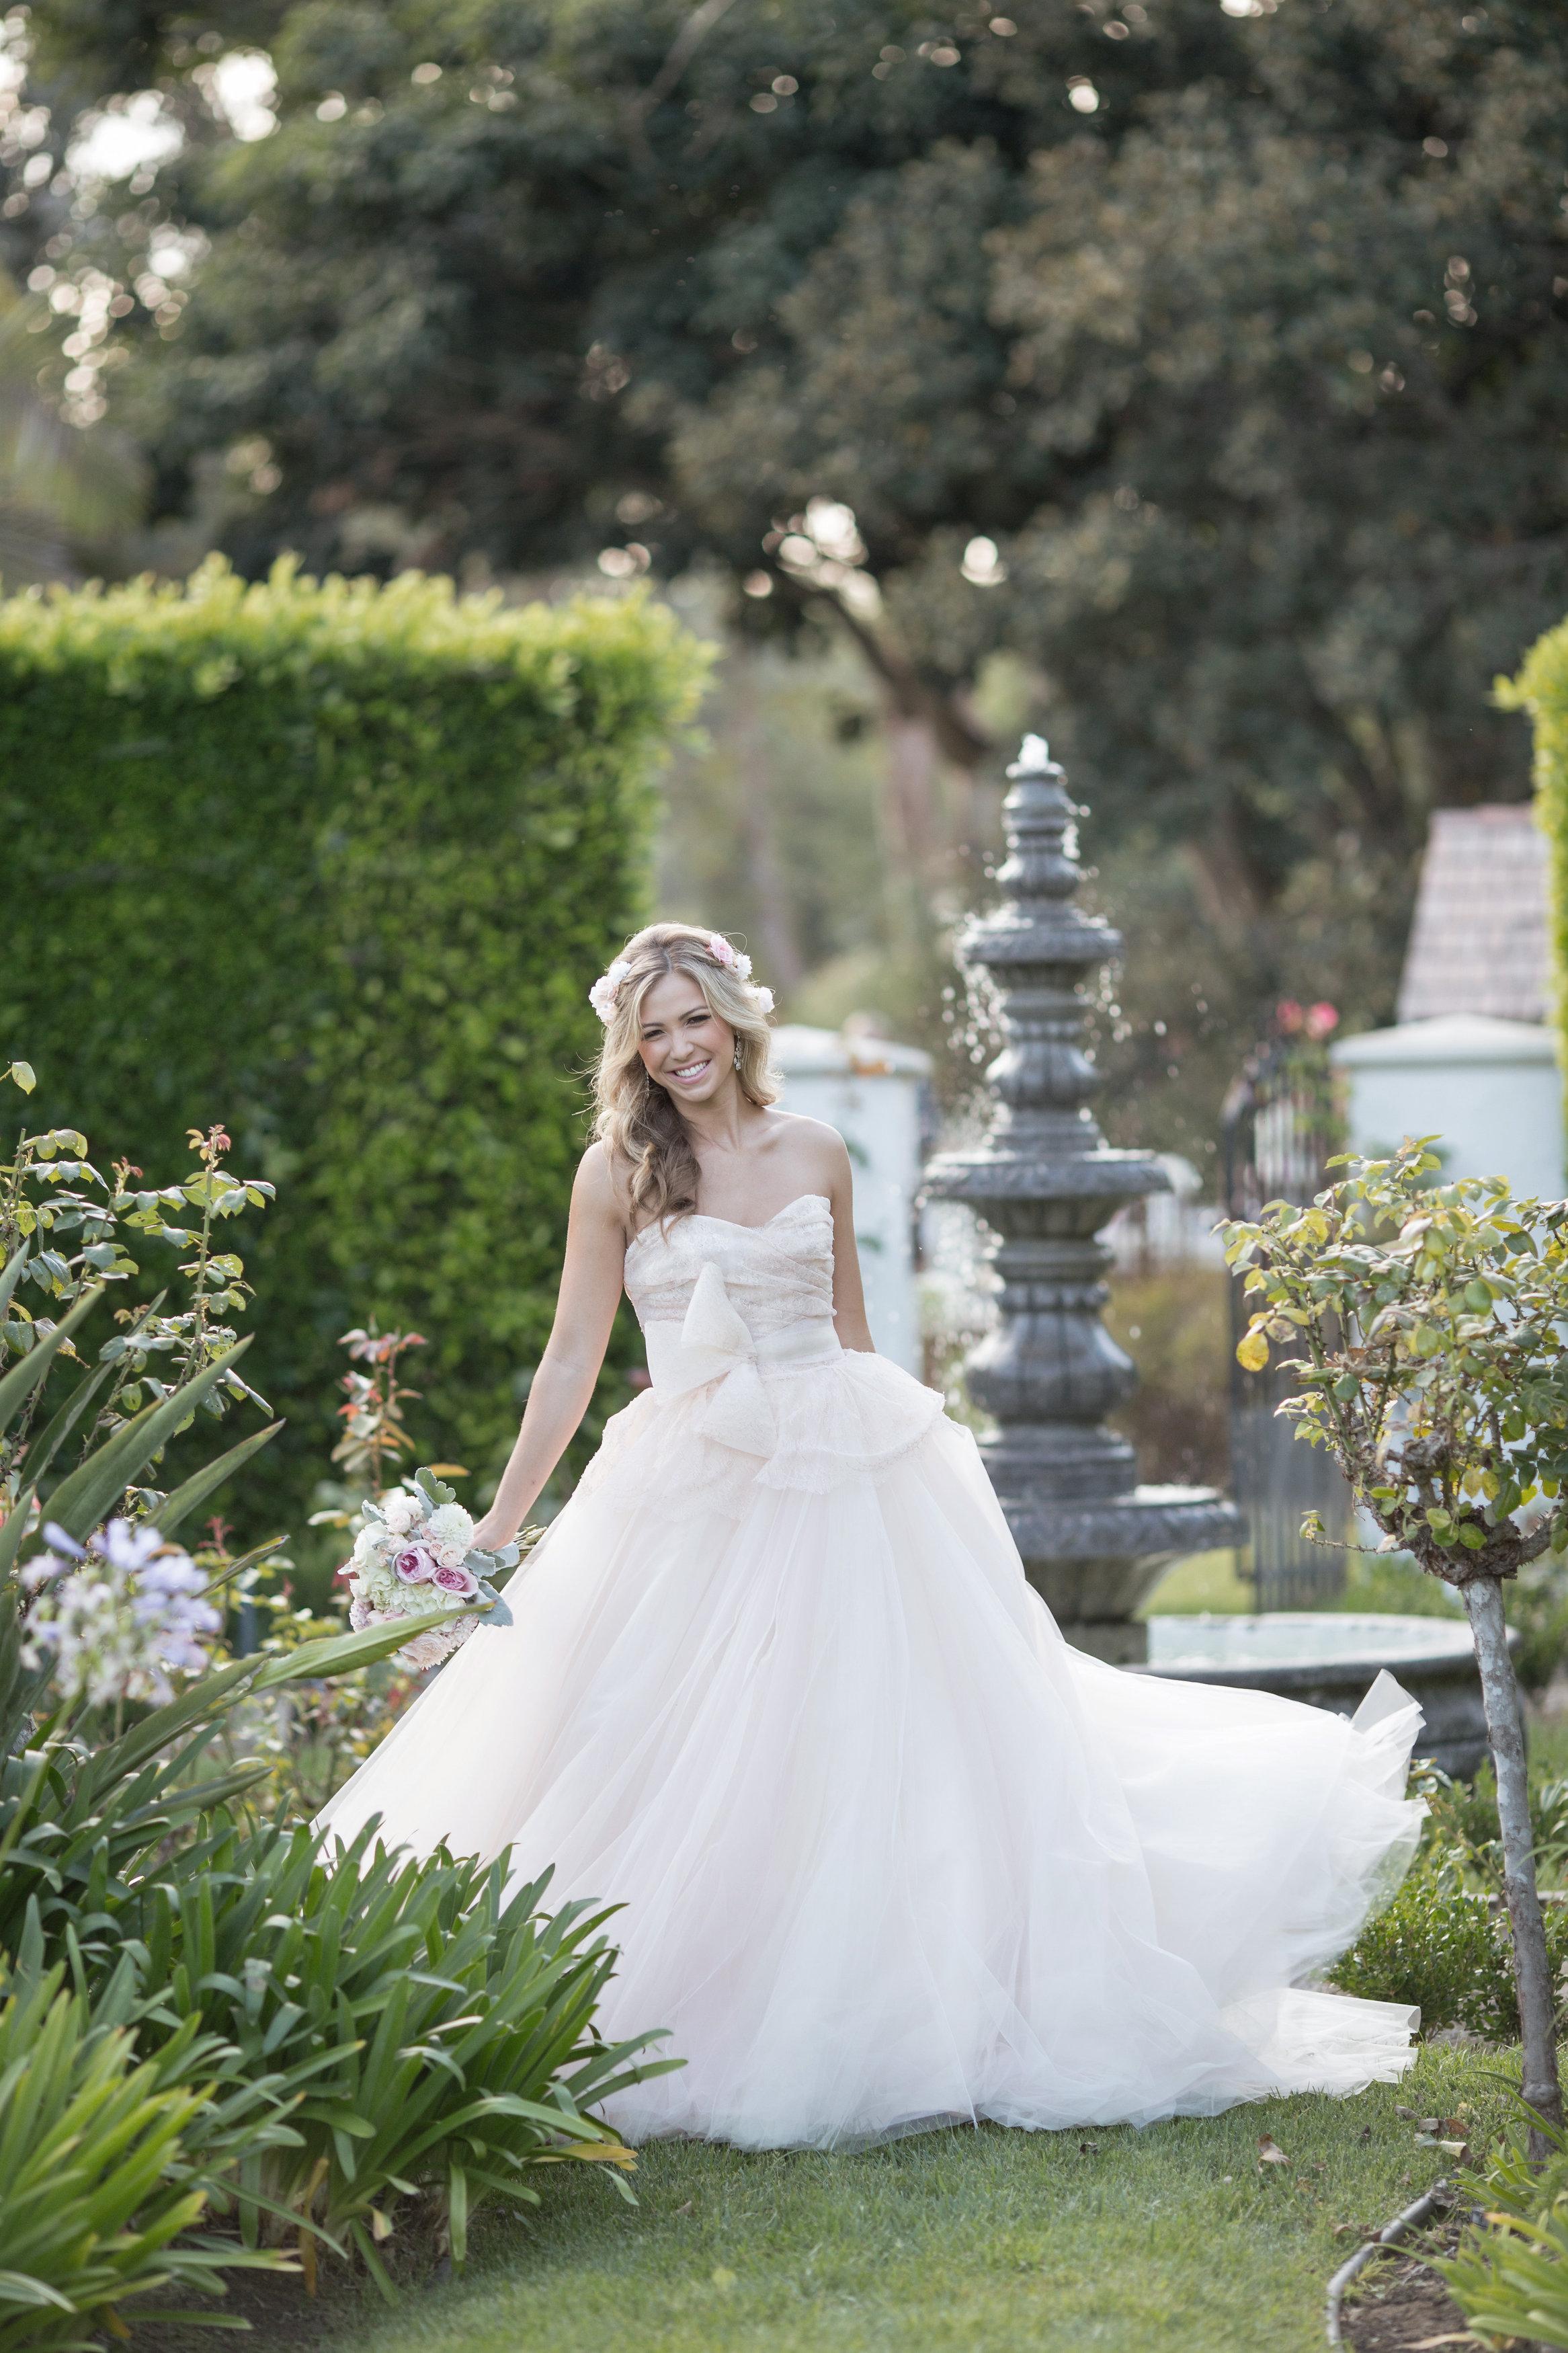 David Manning Photographer Morgan Leigh Boberg San Diego Wedding Dresses